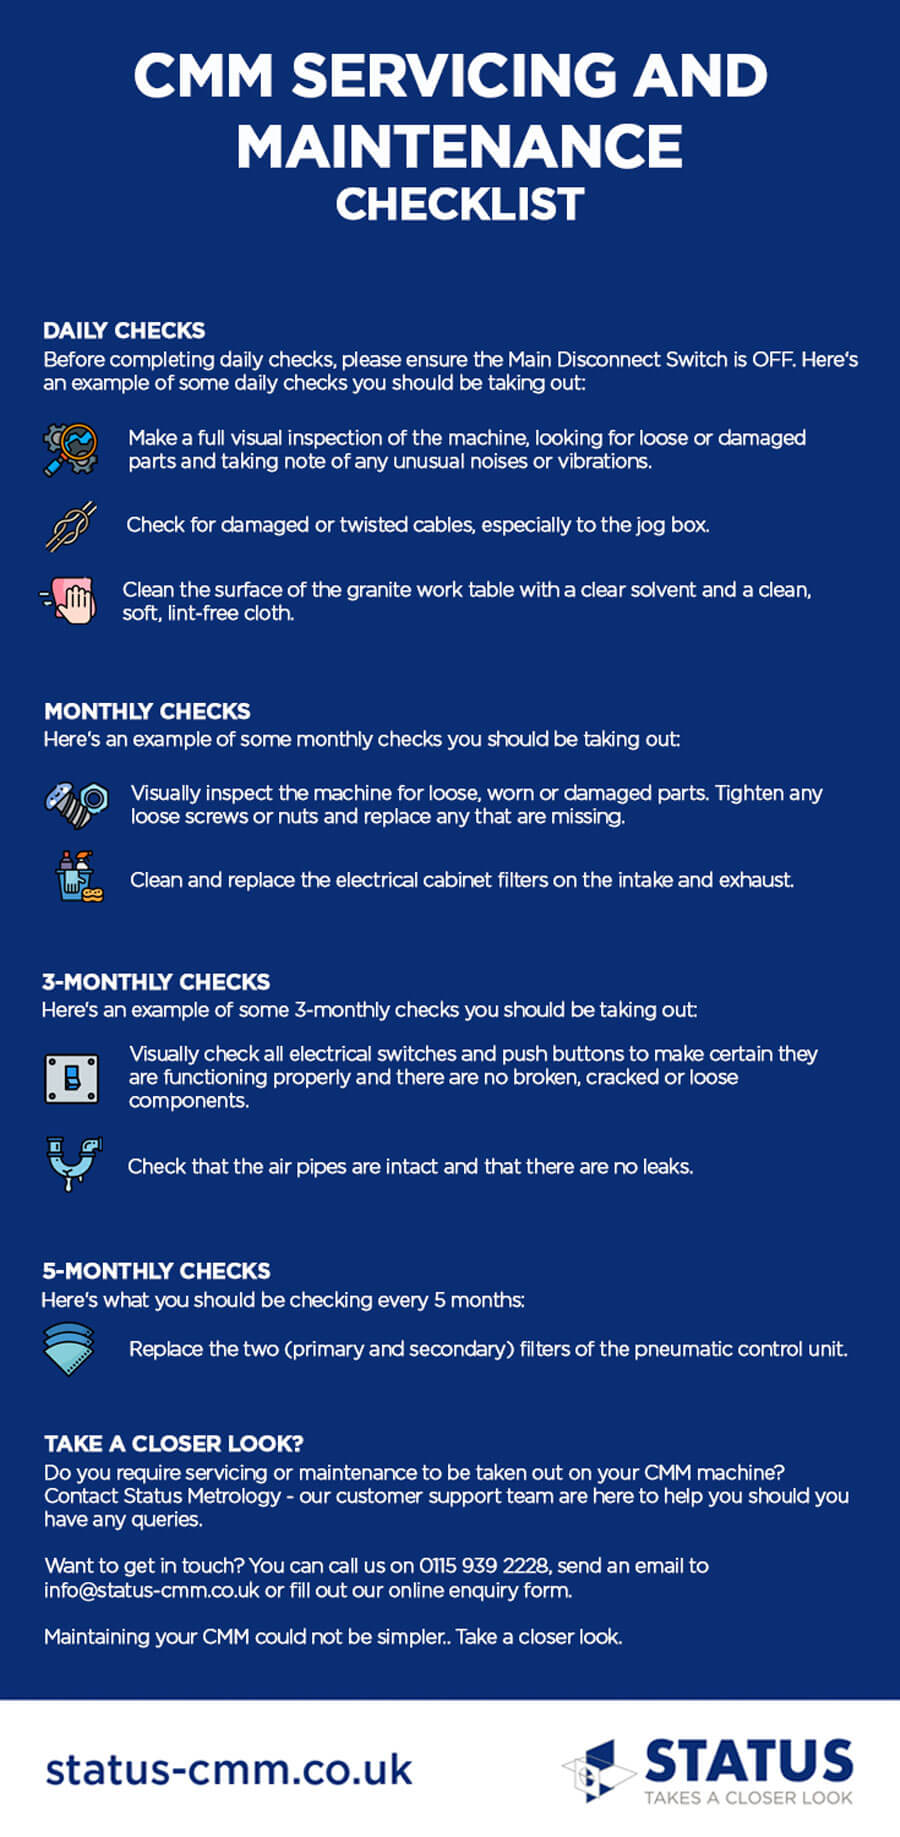 cmm maintenance checklist